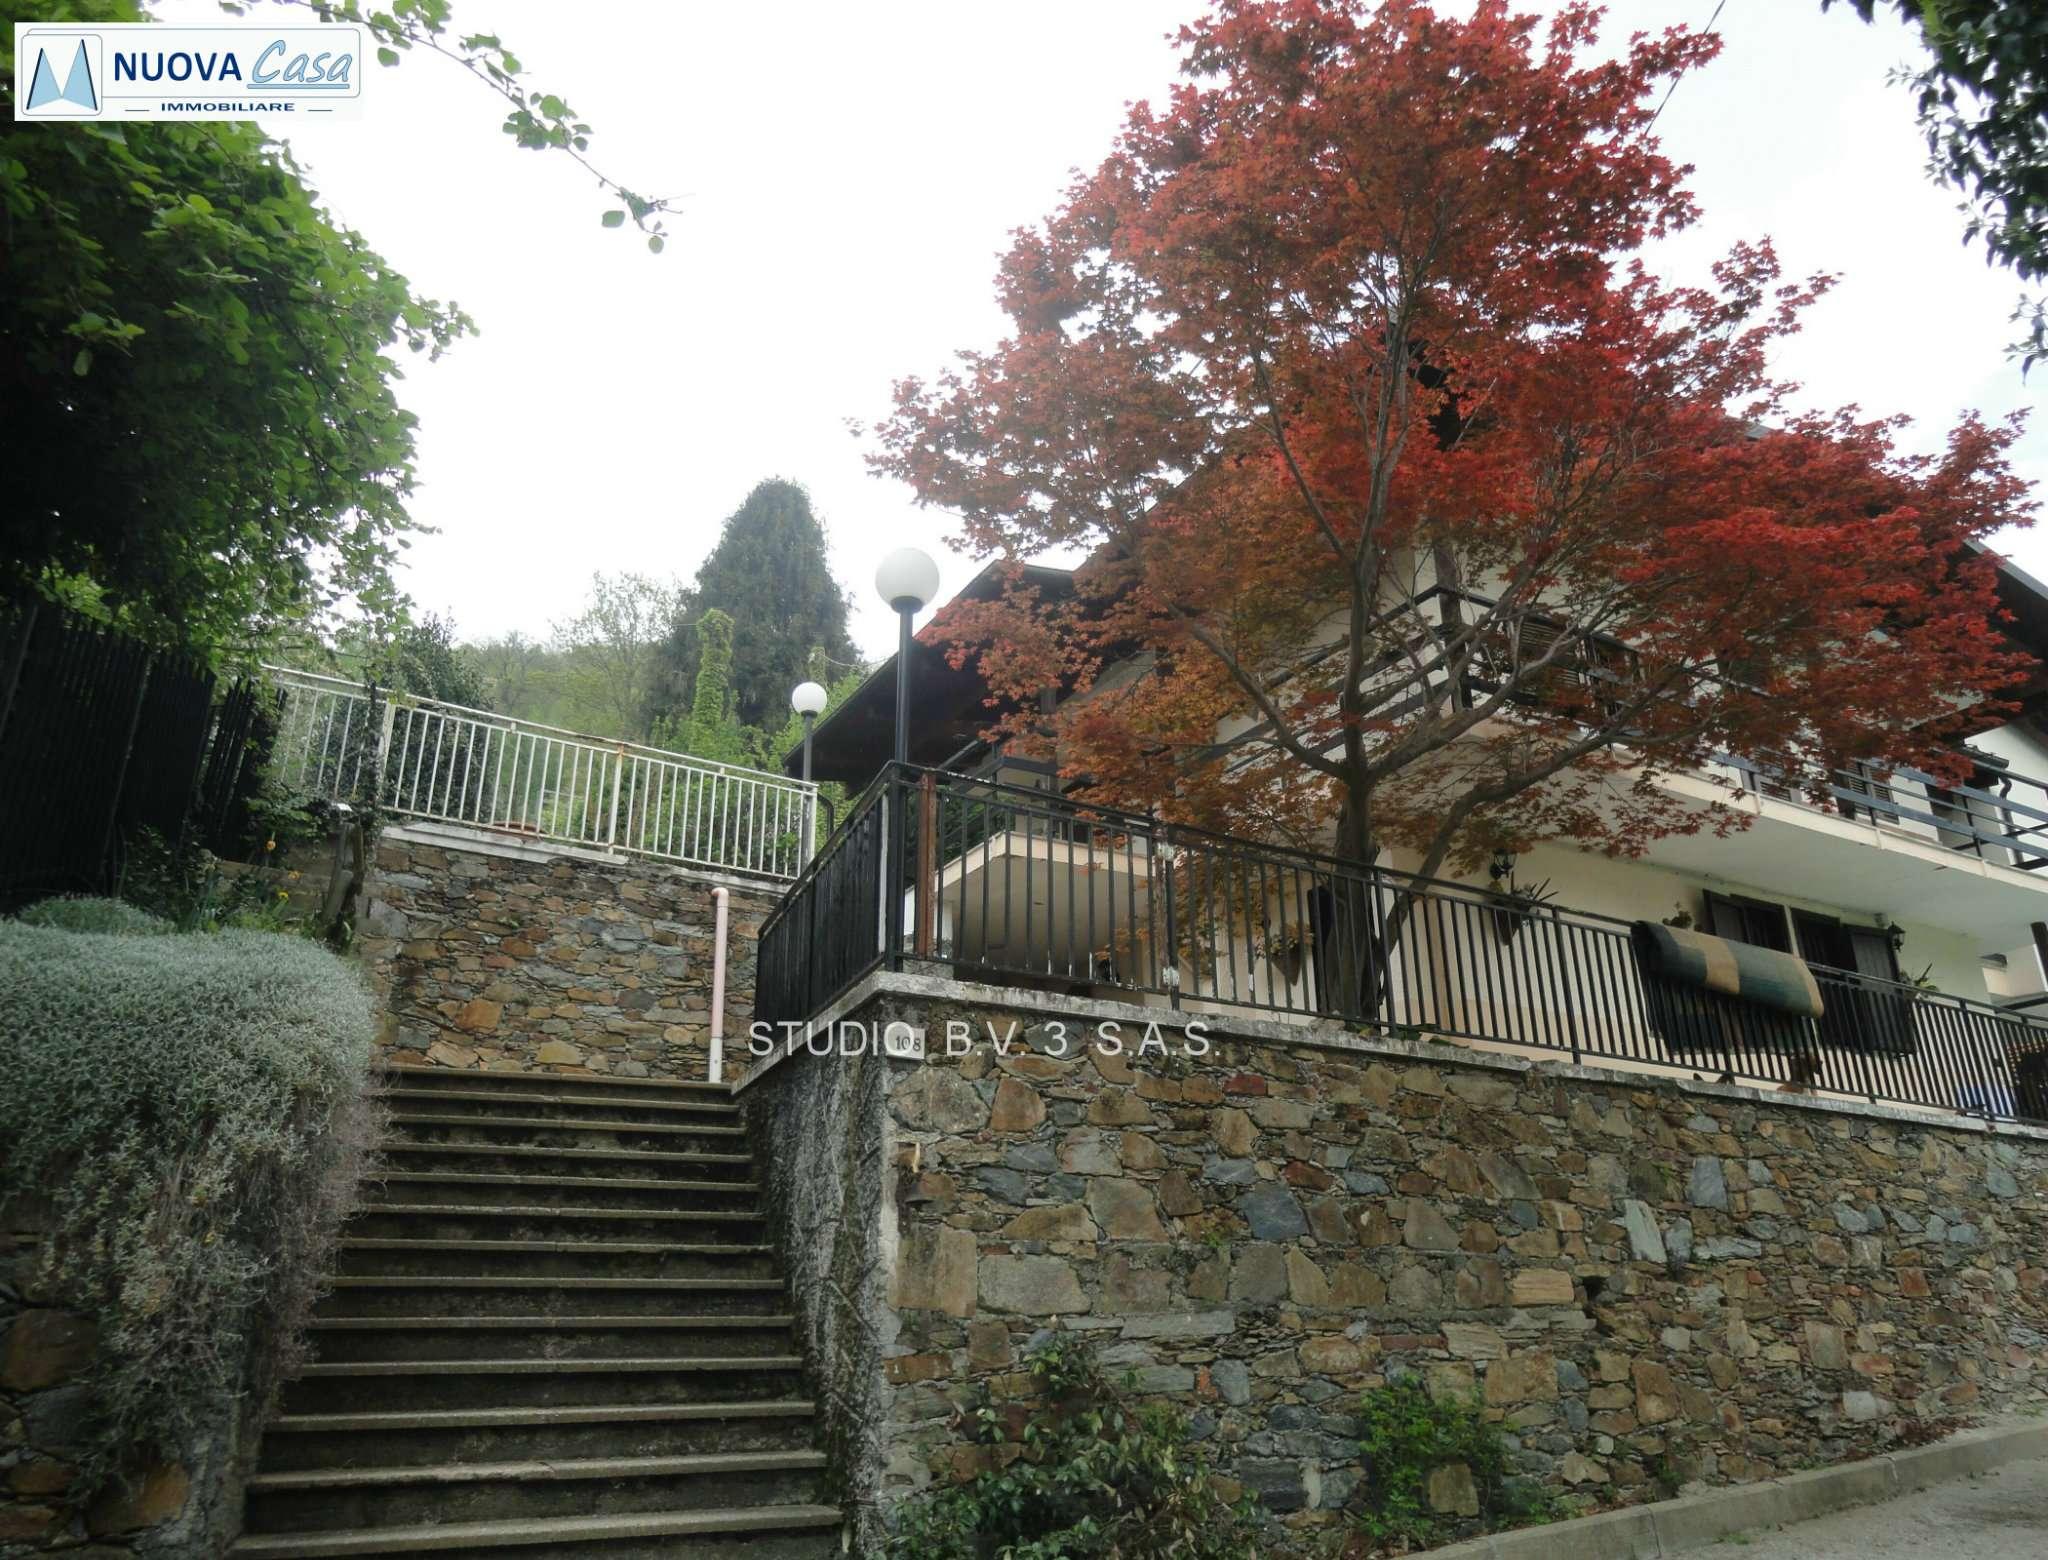 Casa Indipendente in ottime condizioni in vendita Rif. 6910023